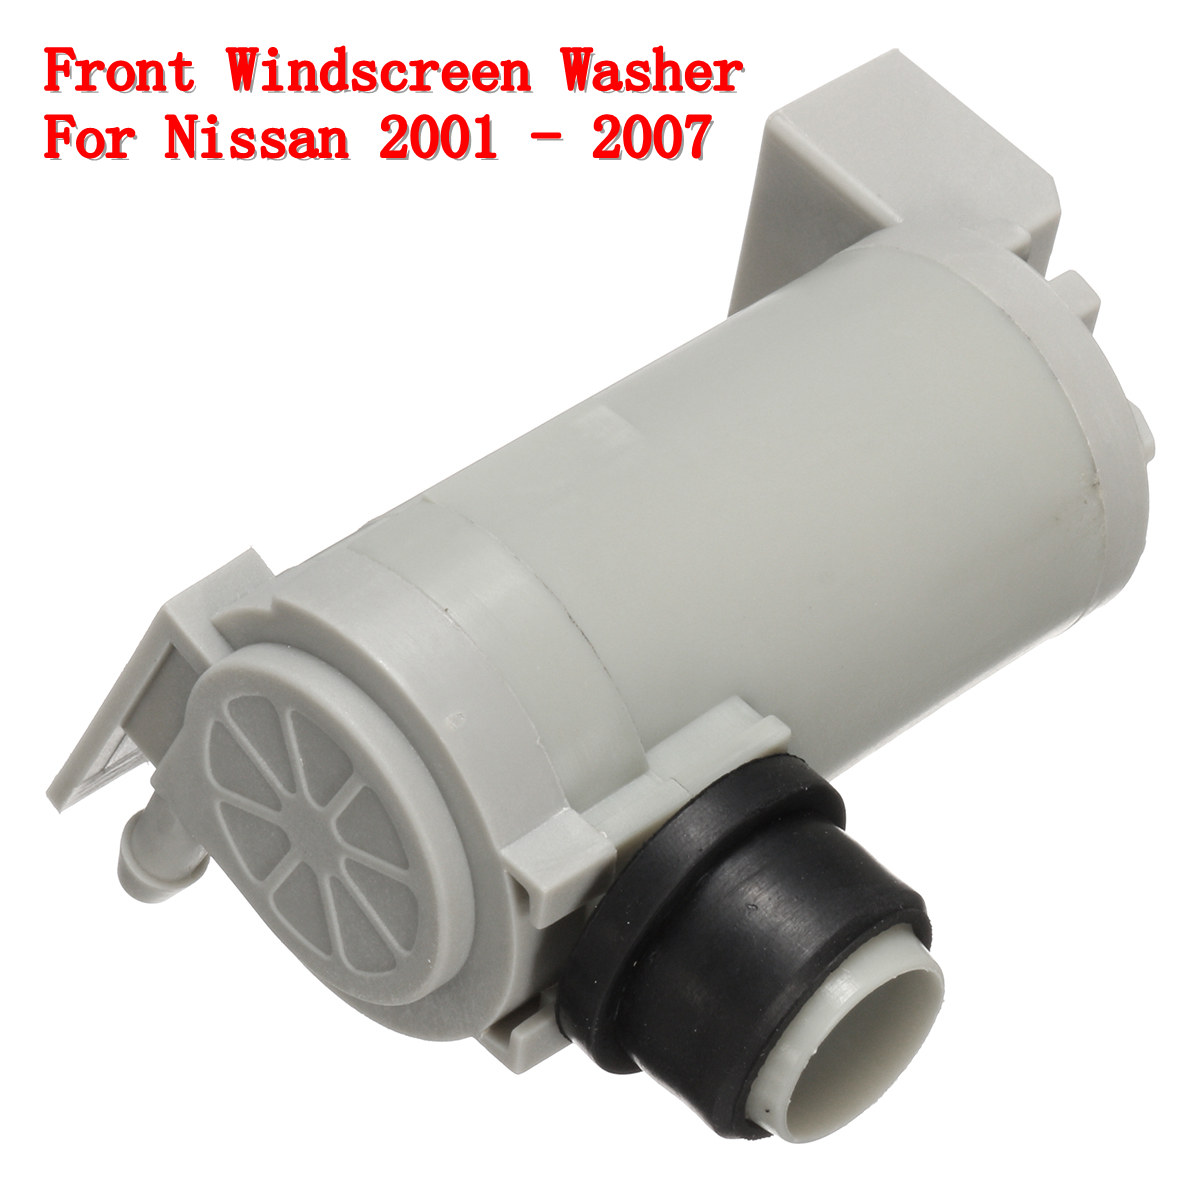 Front Windshield Rear Window Washer Pump For 2001-2007 Nissan Xtrail W//Grommet